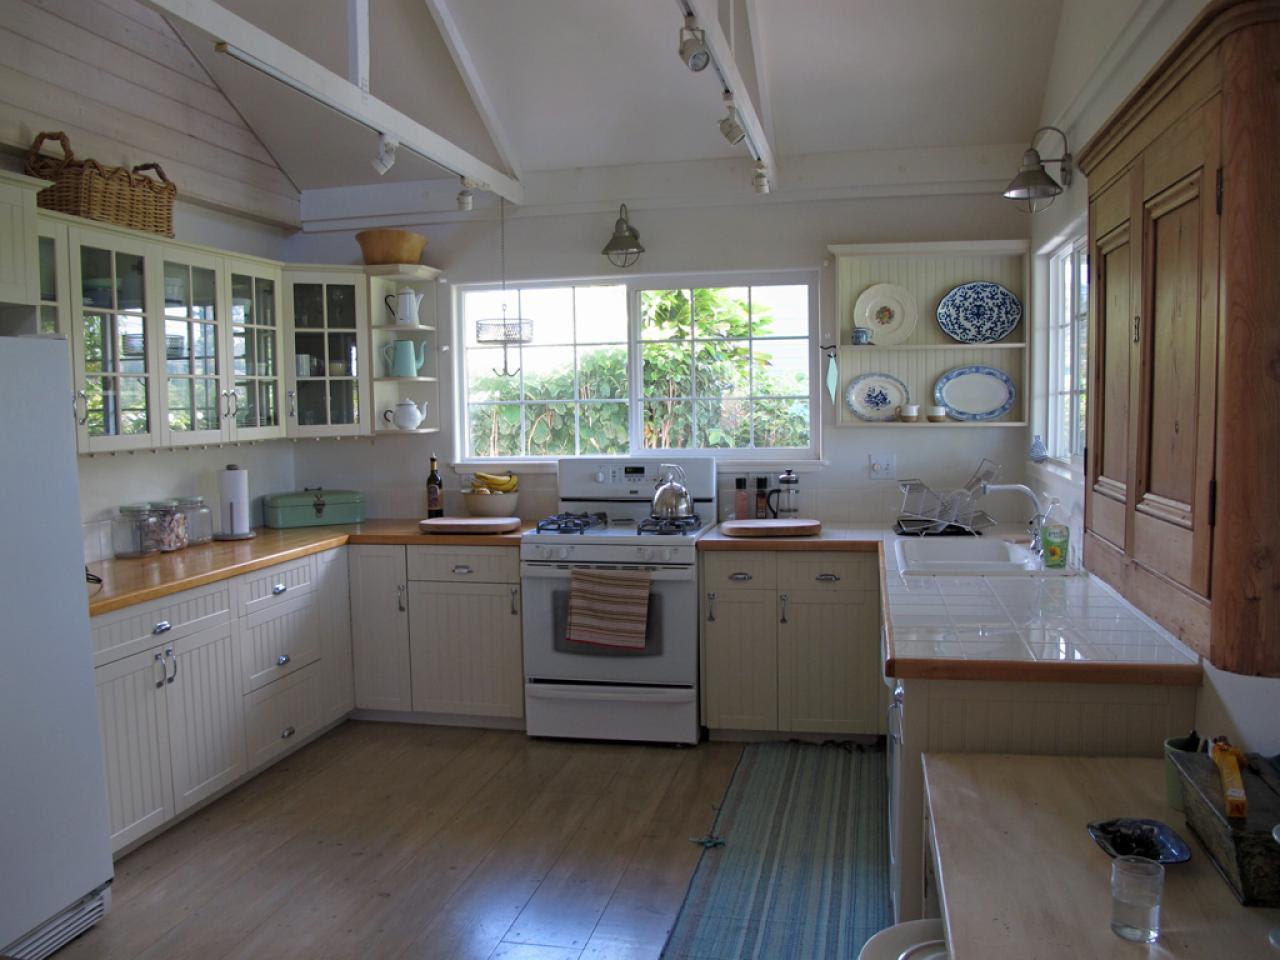 Vintage Kitchen Decorating: Pictures & Ideas From HGTV | HGTV